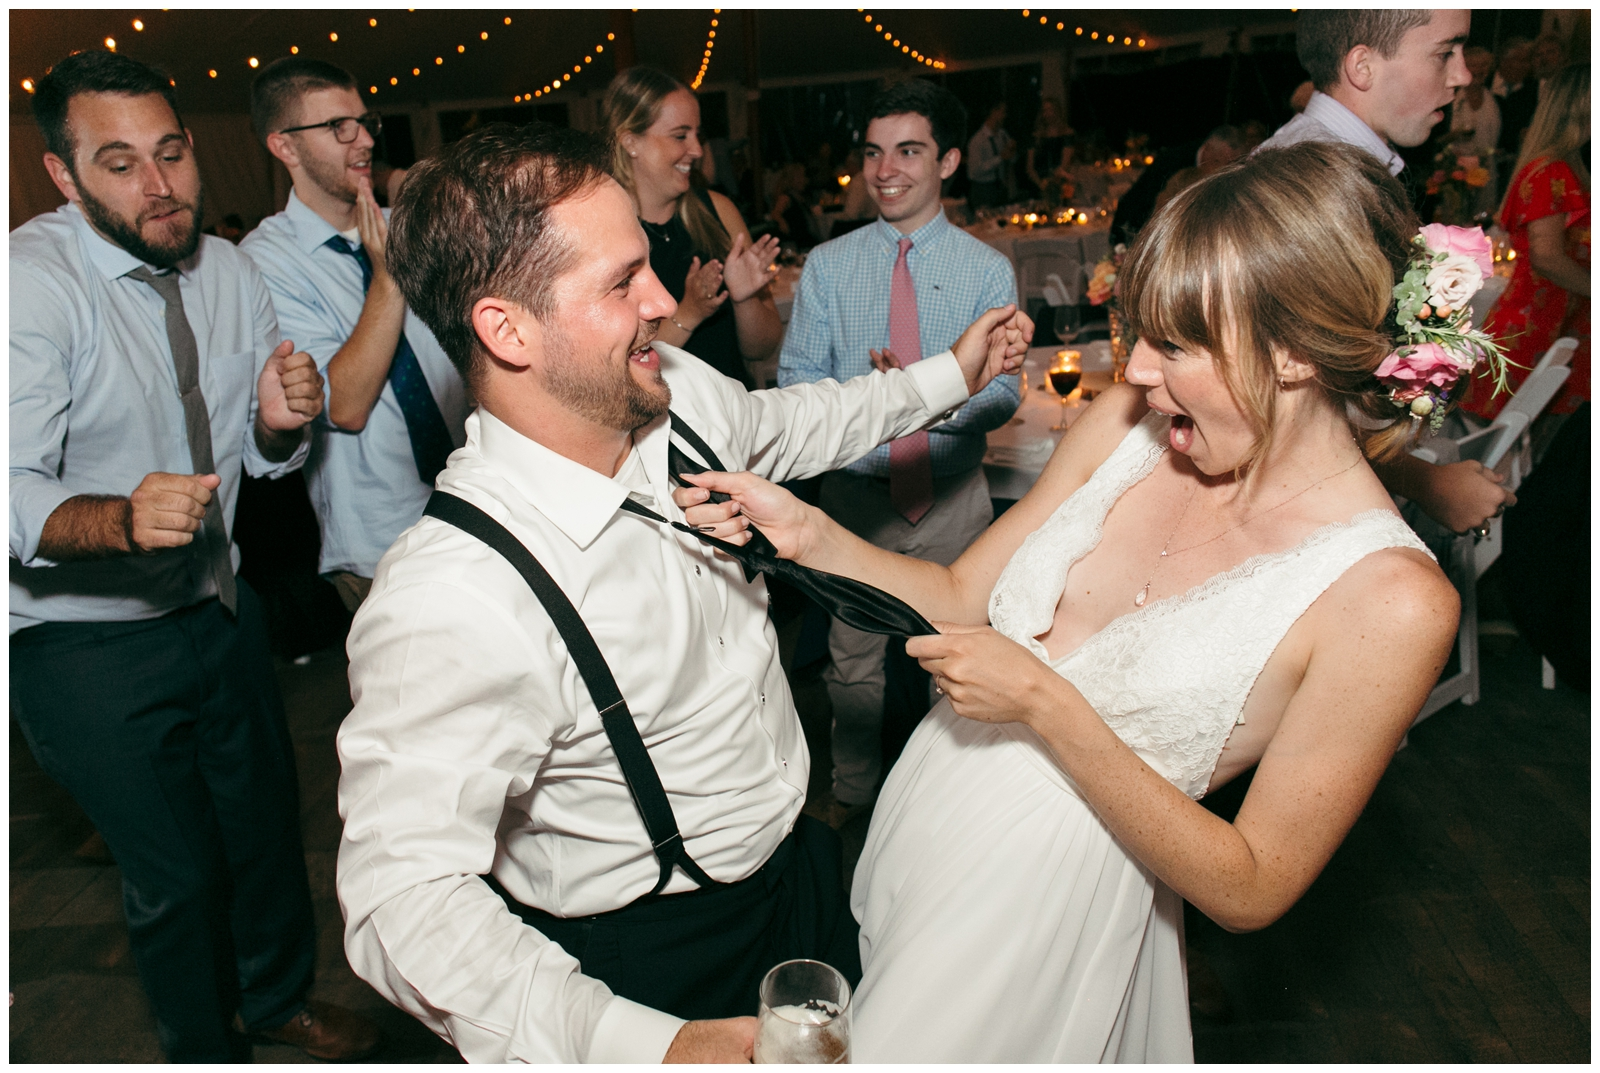 Moraine-Farm-wedding-Bailey-Q-Photo-Massachusetts-wedding-photpgrapher-177.jpg